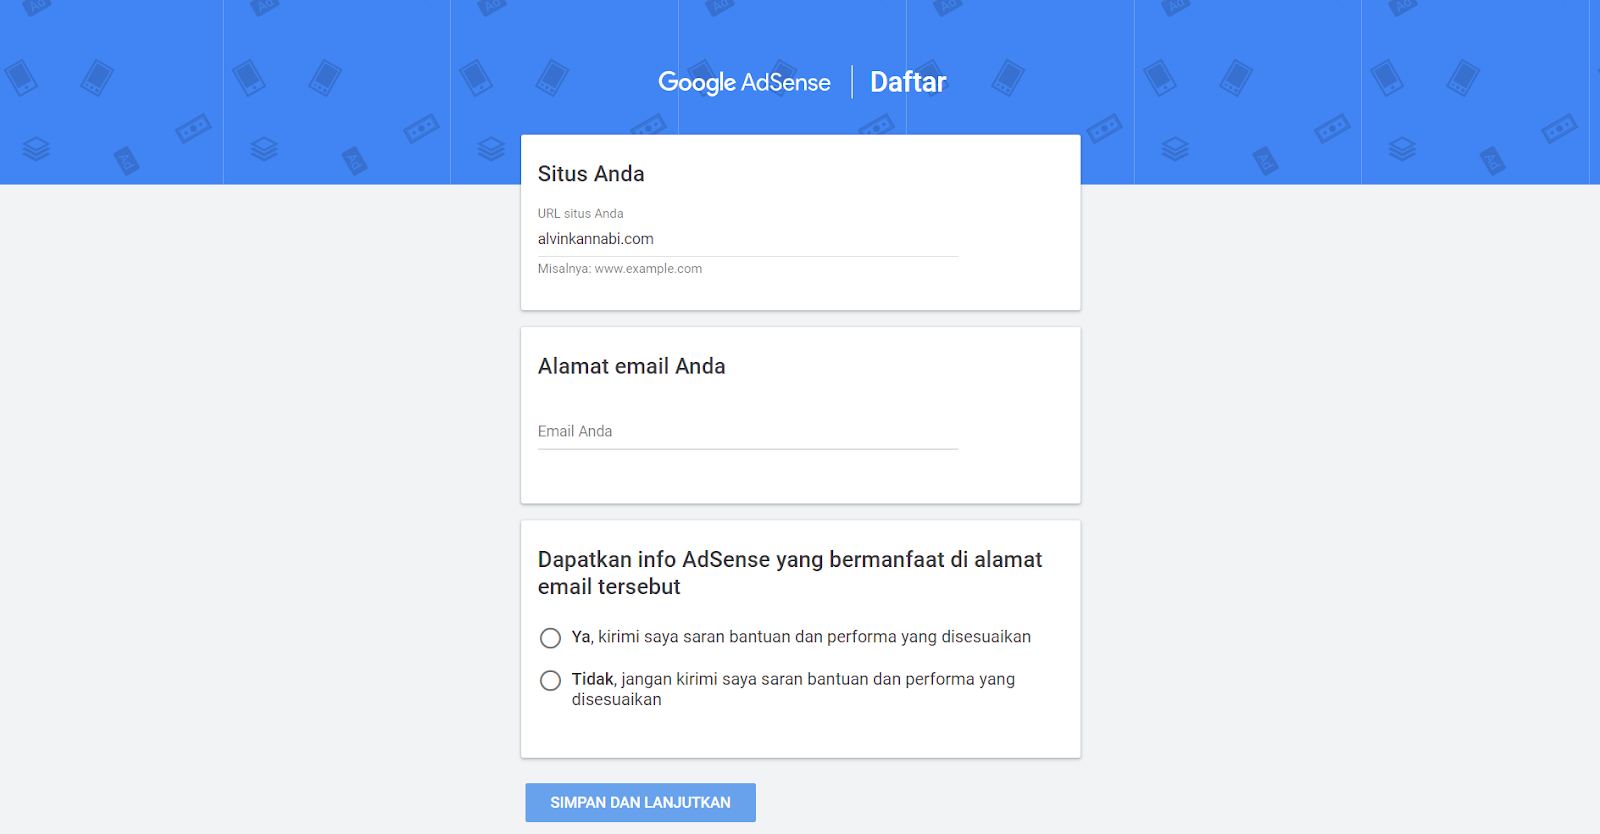 cara-lolos-google-adsense-update-2019